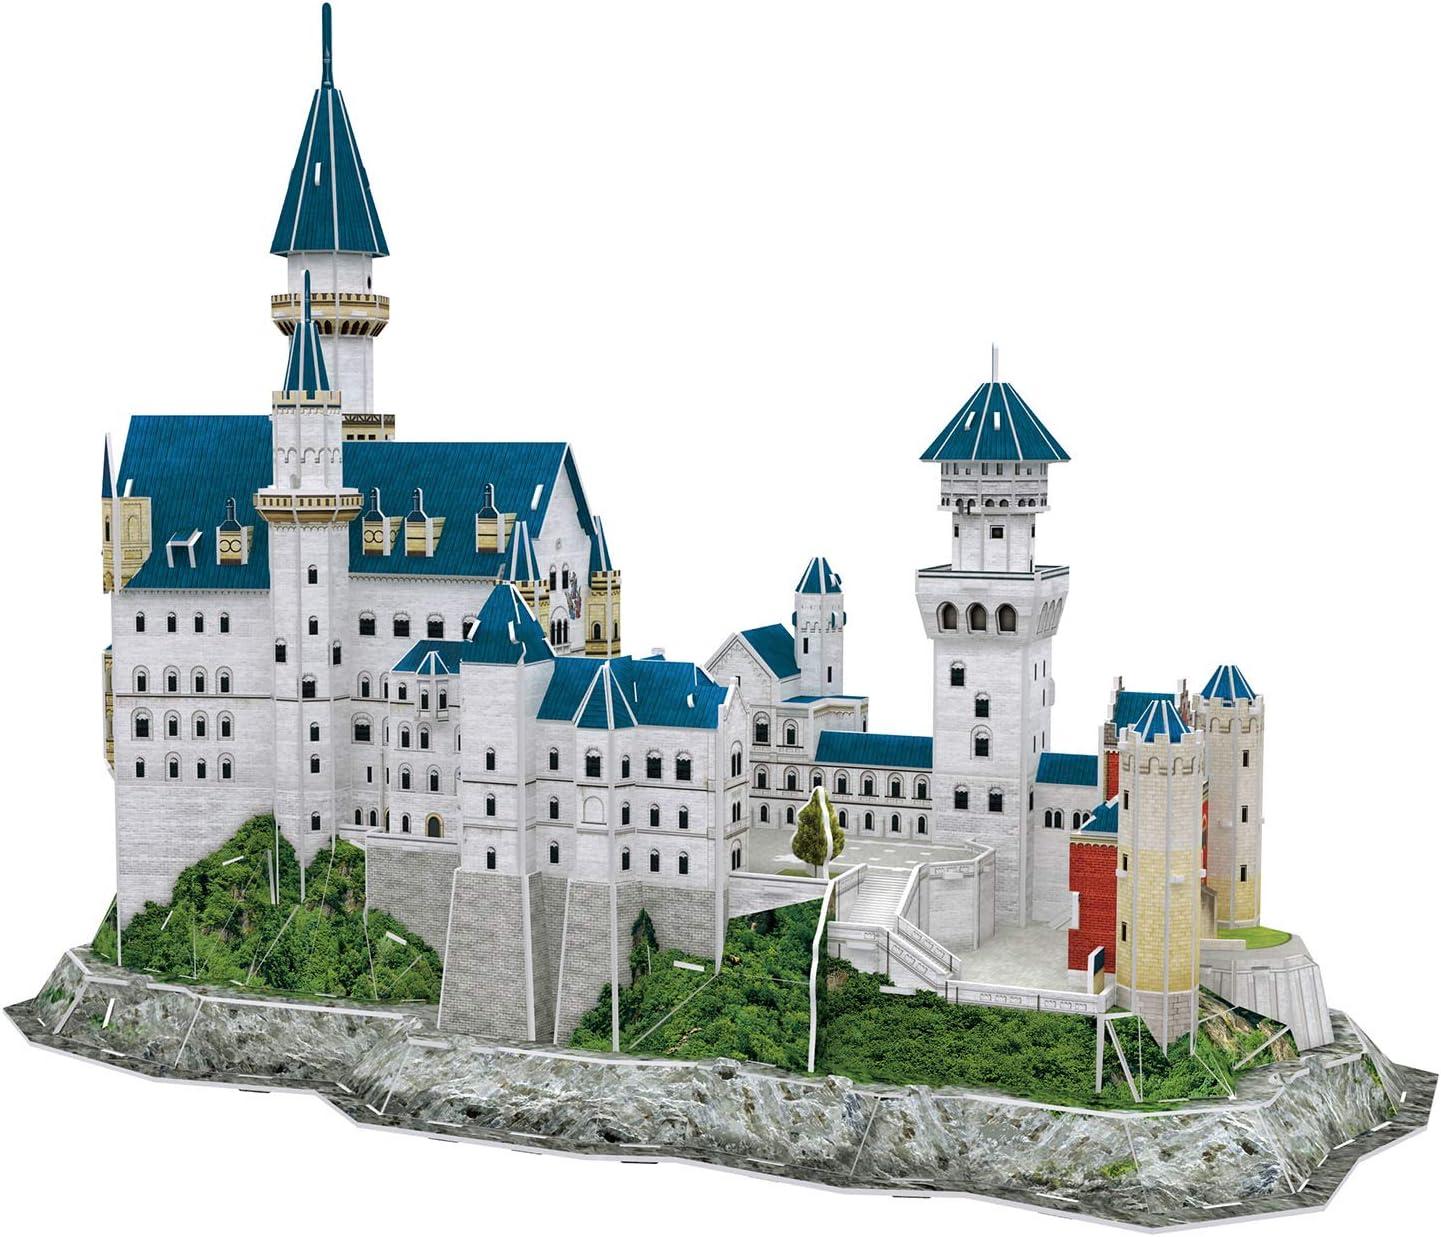 00205 Longitud 44,0cm 3D Puzzle Revell- Castillo de Neuschwanstein Multicolor